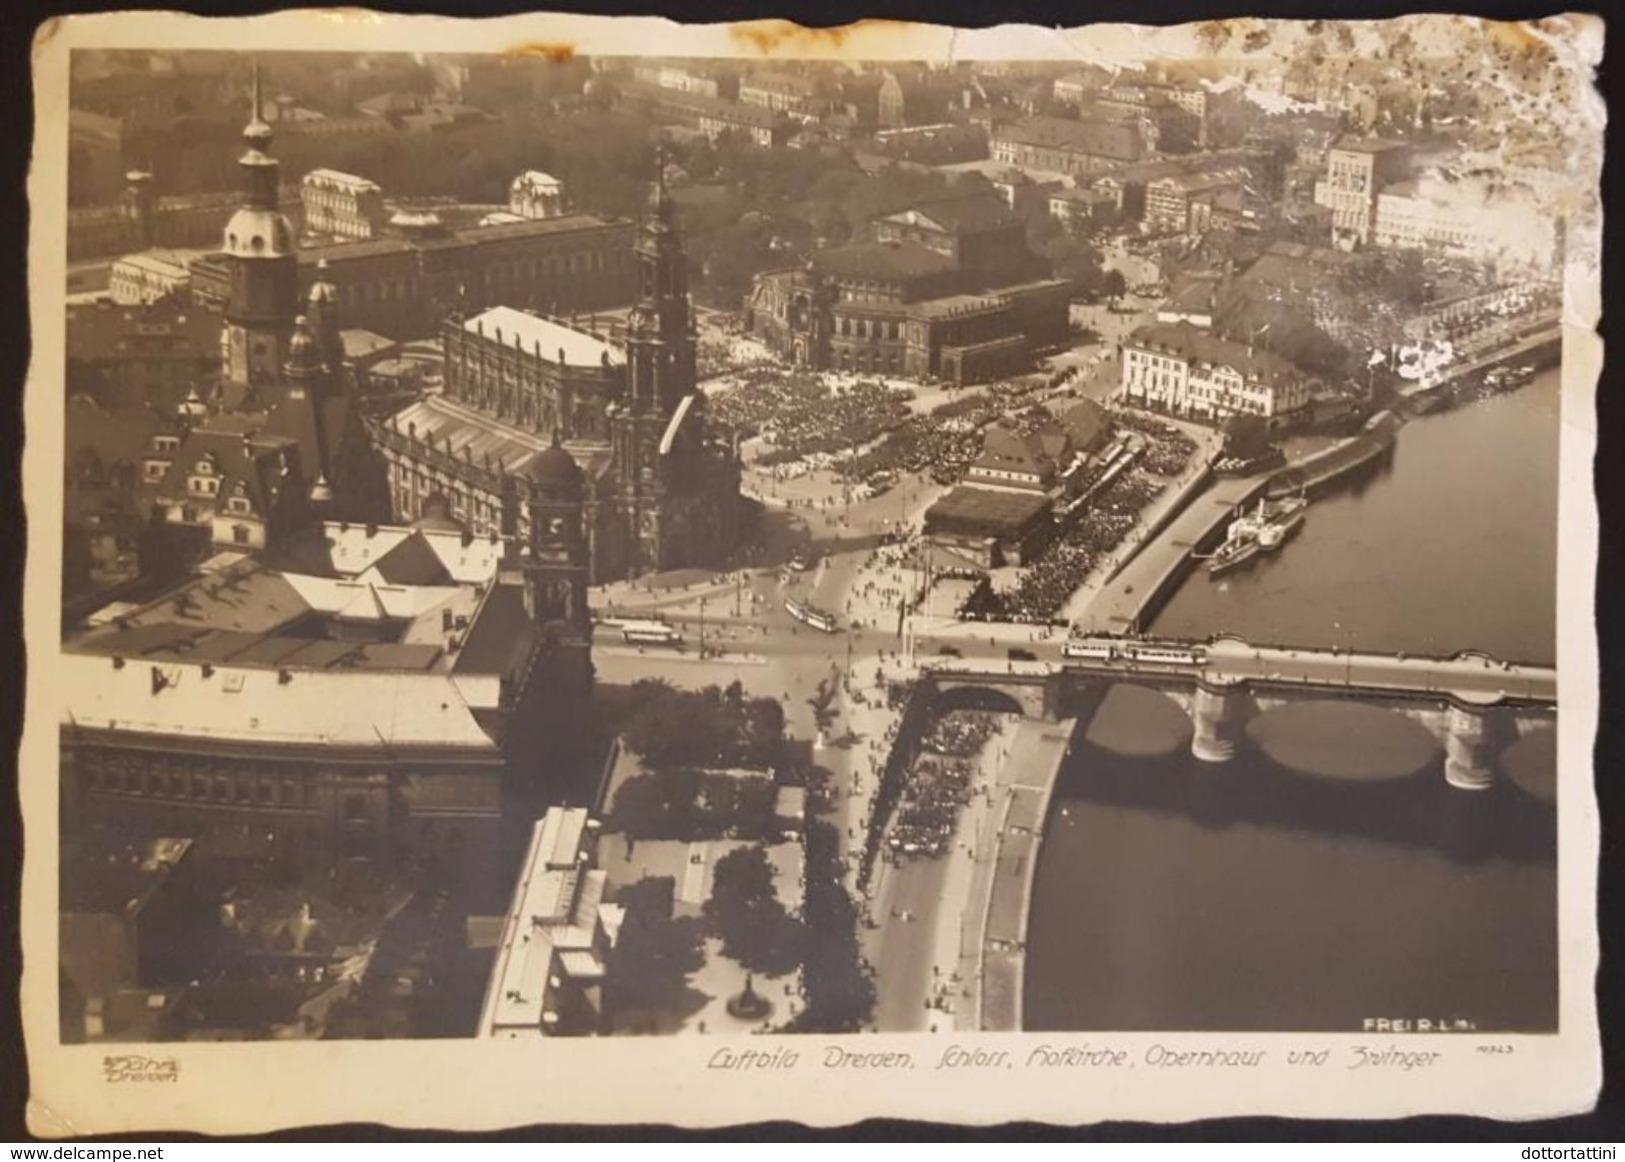 DRESDEN - Luftbild Schloss Hofkirche Opernhaus Und Zwinger - Vg 1942 To Skopje (Bulgaria) - Dresden